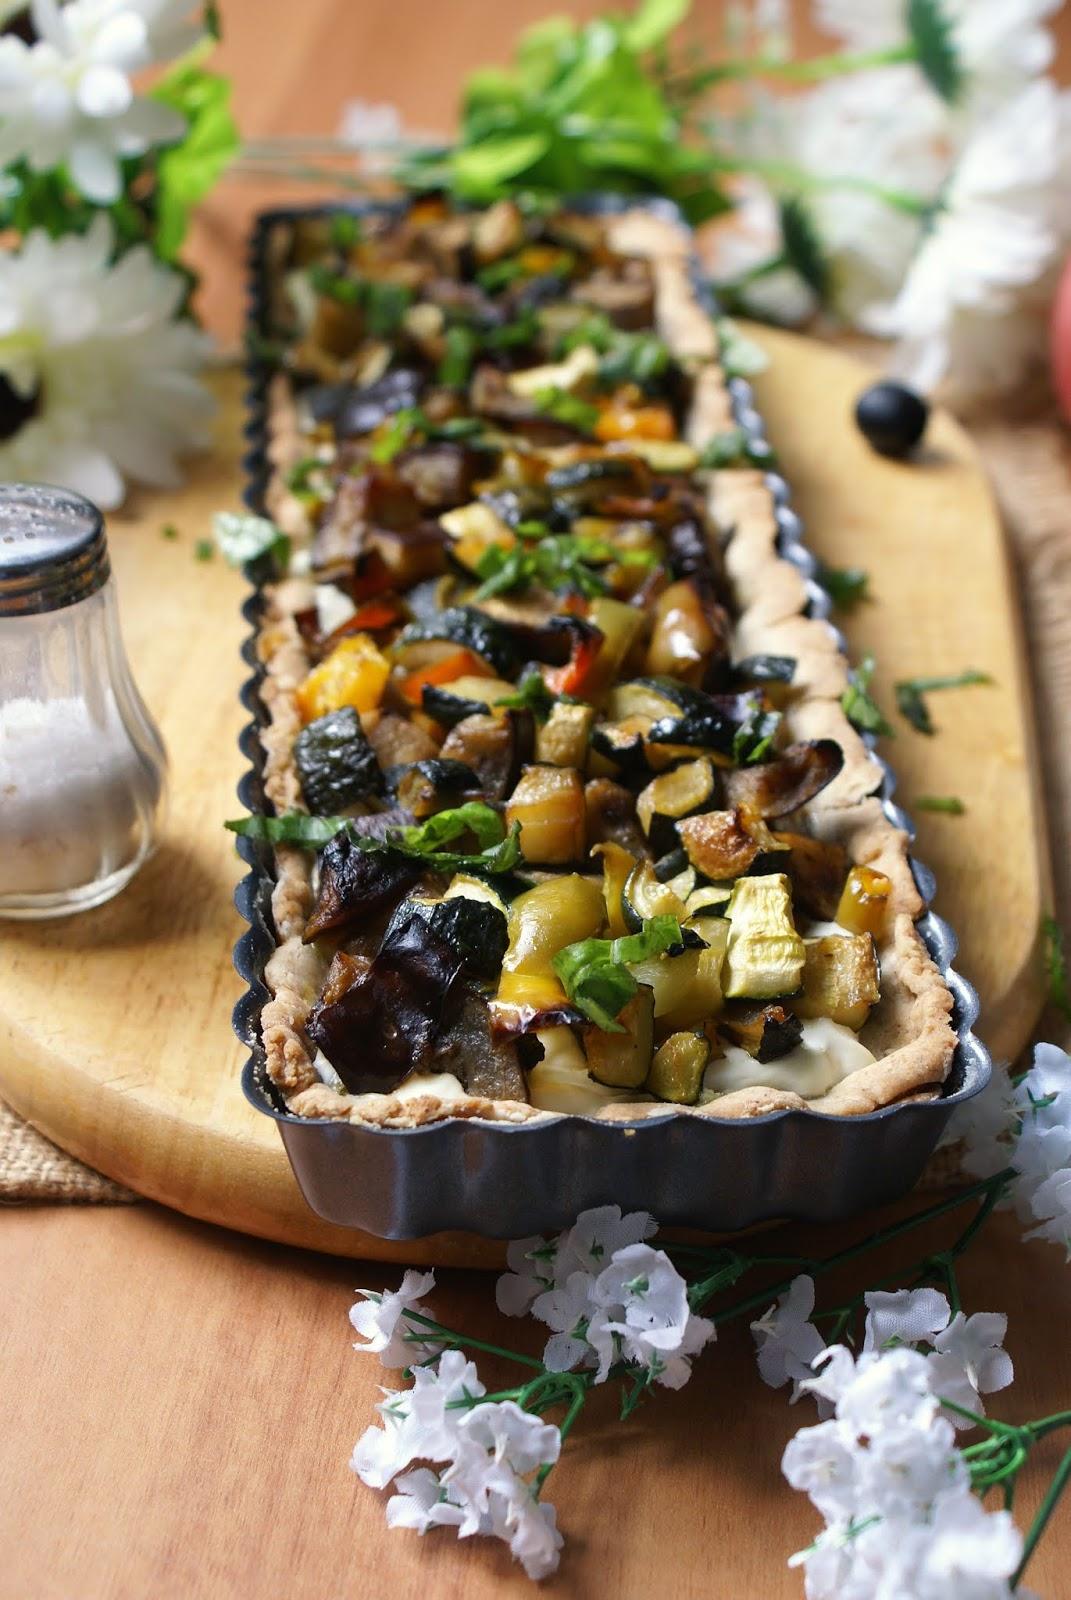 Crostata salata con verdure senza glutine